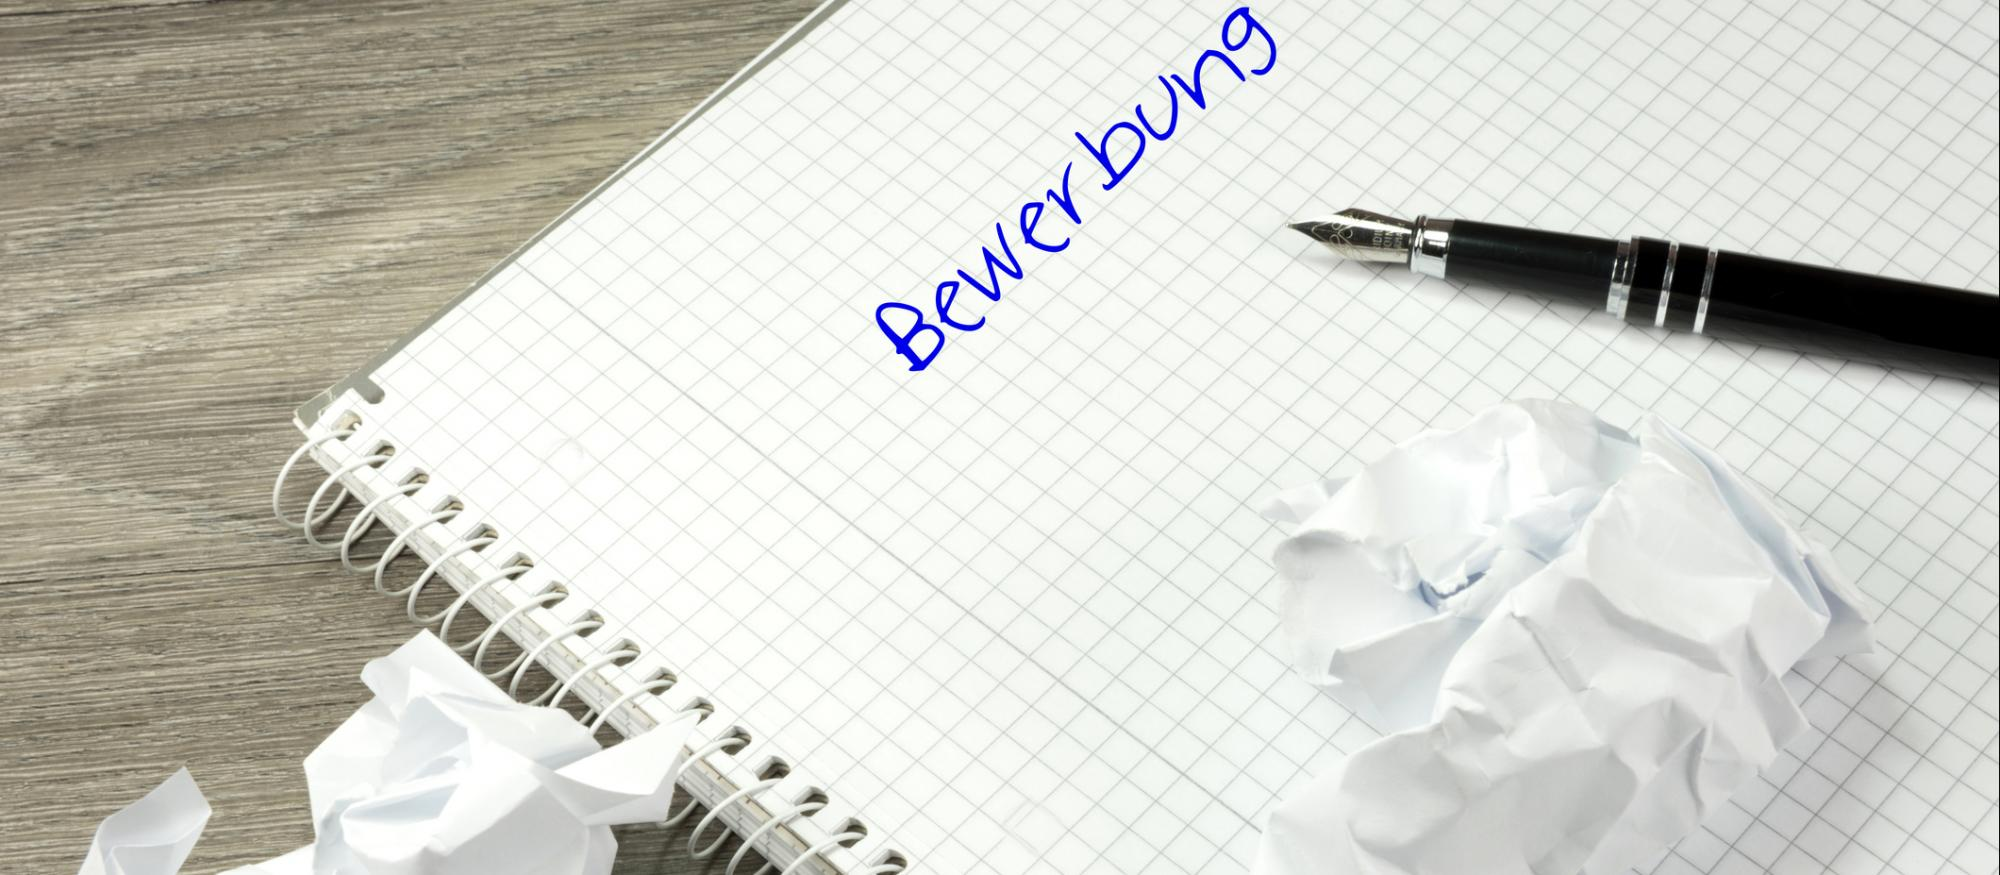 verfallsdatum fr bewerbungsunterlagen - Allianz Bewerbung